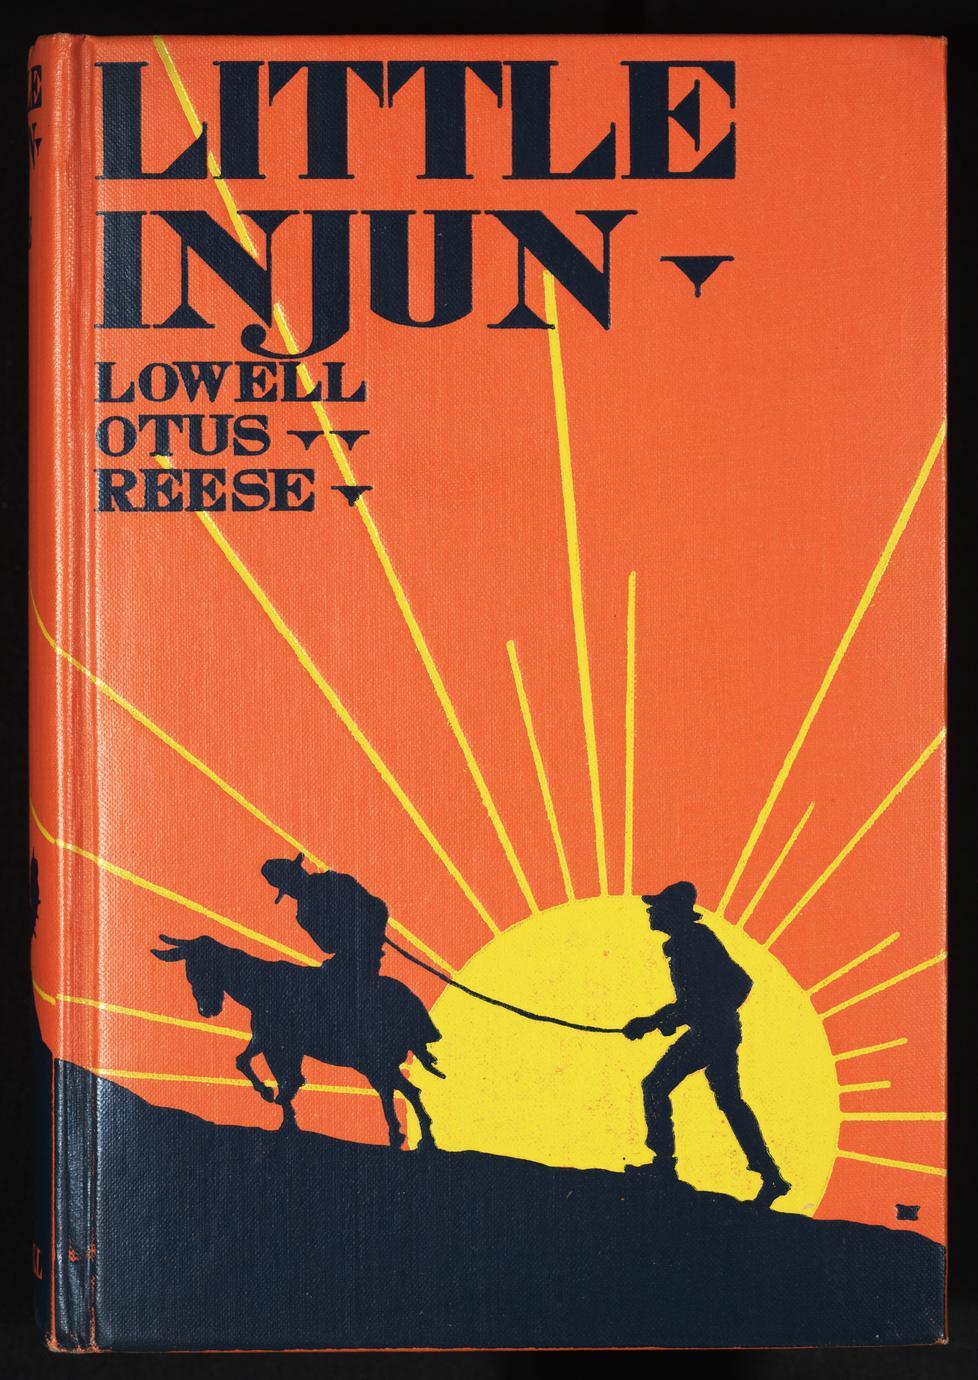 Little injun (1 of 3)